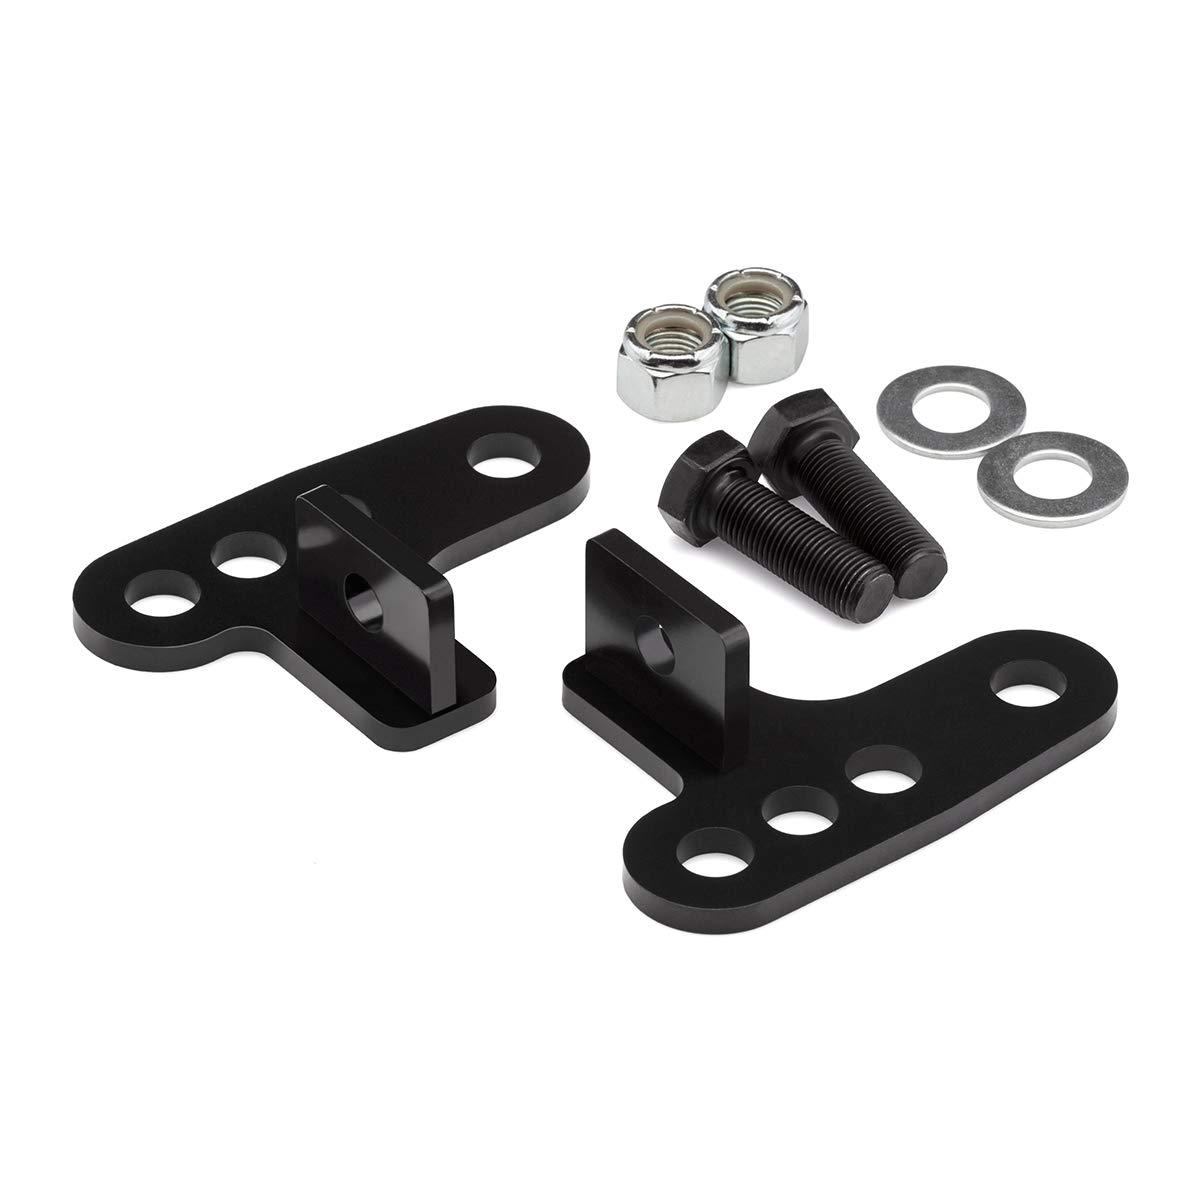 BlackPath - Harley-Davidson Adjustable 1'' + 2'' + 3'' Rear Lowering Link Kit Sportster 883 + Sportster 1200 Motorcycle Drop Links (Black) High Carbon Steel